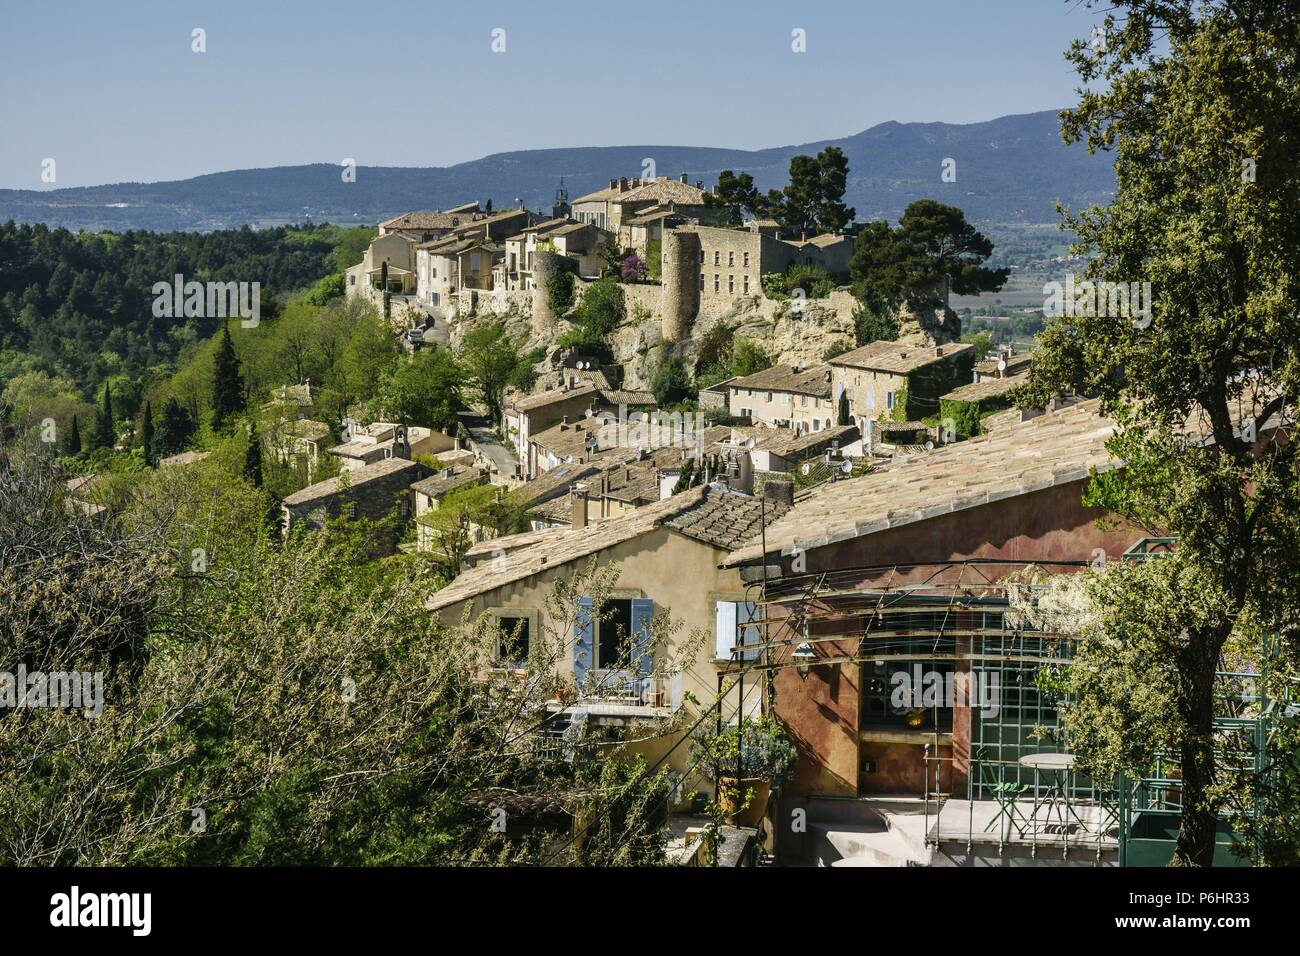 ciudadela fortificada,Menerbes, alpes de Provenza, montes Luberon, Francia, Europa. - Stock Image